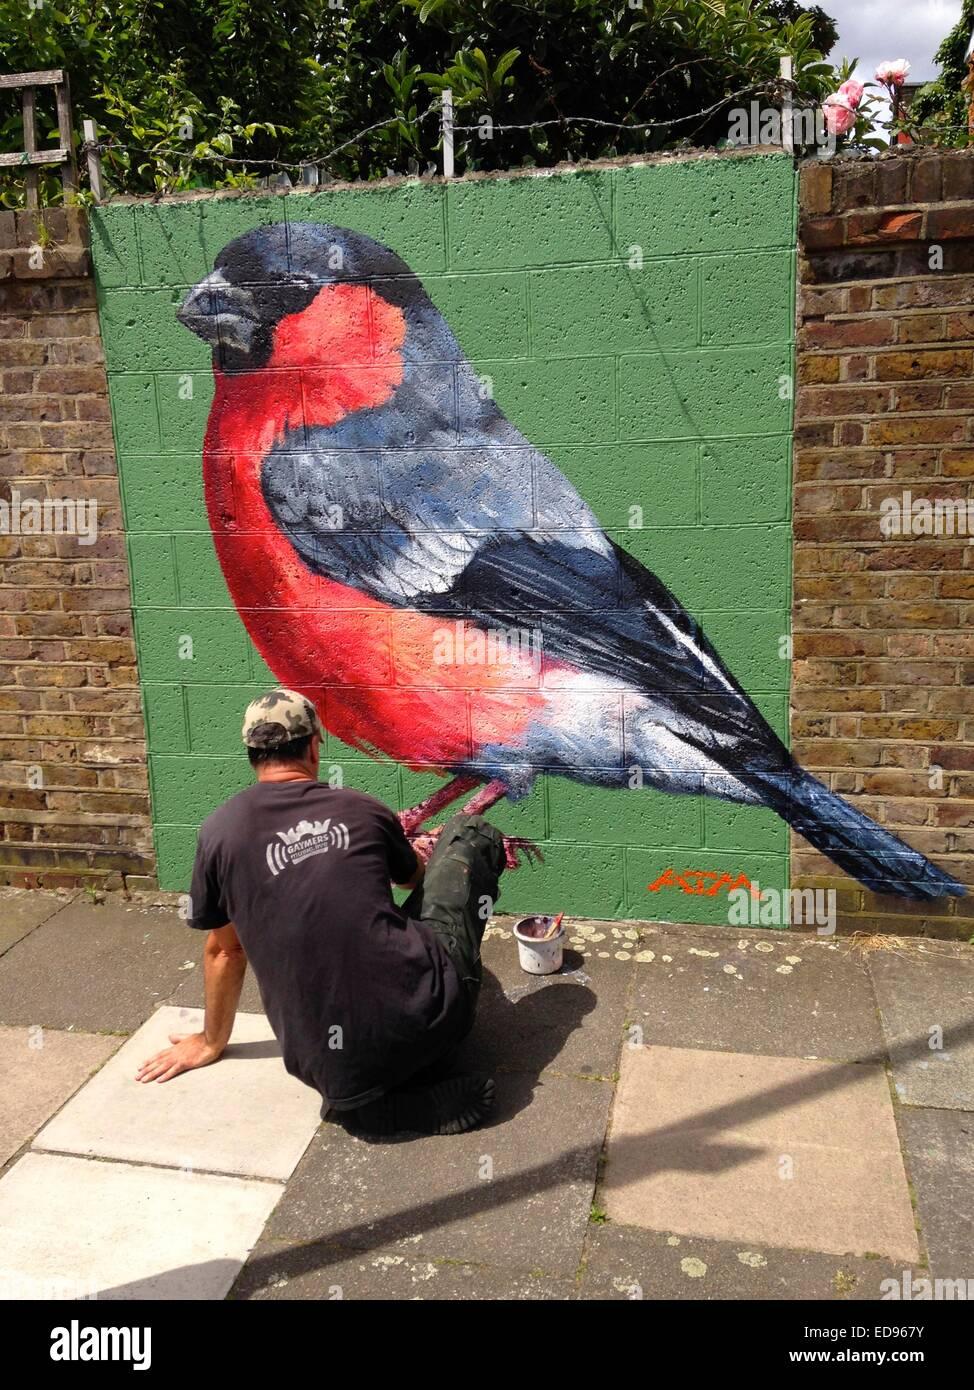 Graffiti by ATM bullfinch haringey n15 london - Stock Image